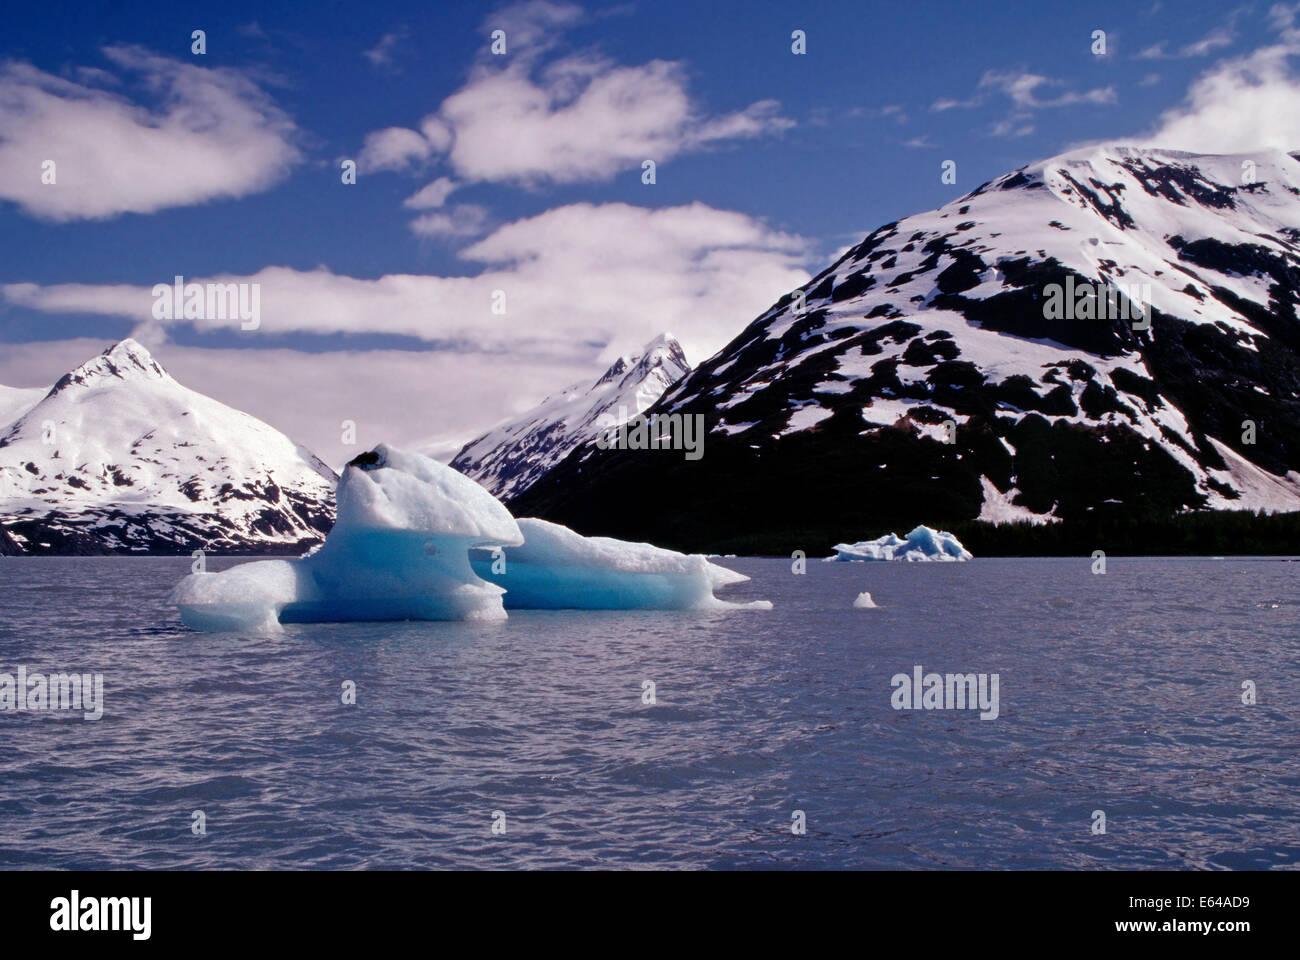 An ioceberg floats loose from the Portage Glacier,Alaska - Stock Image